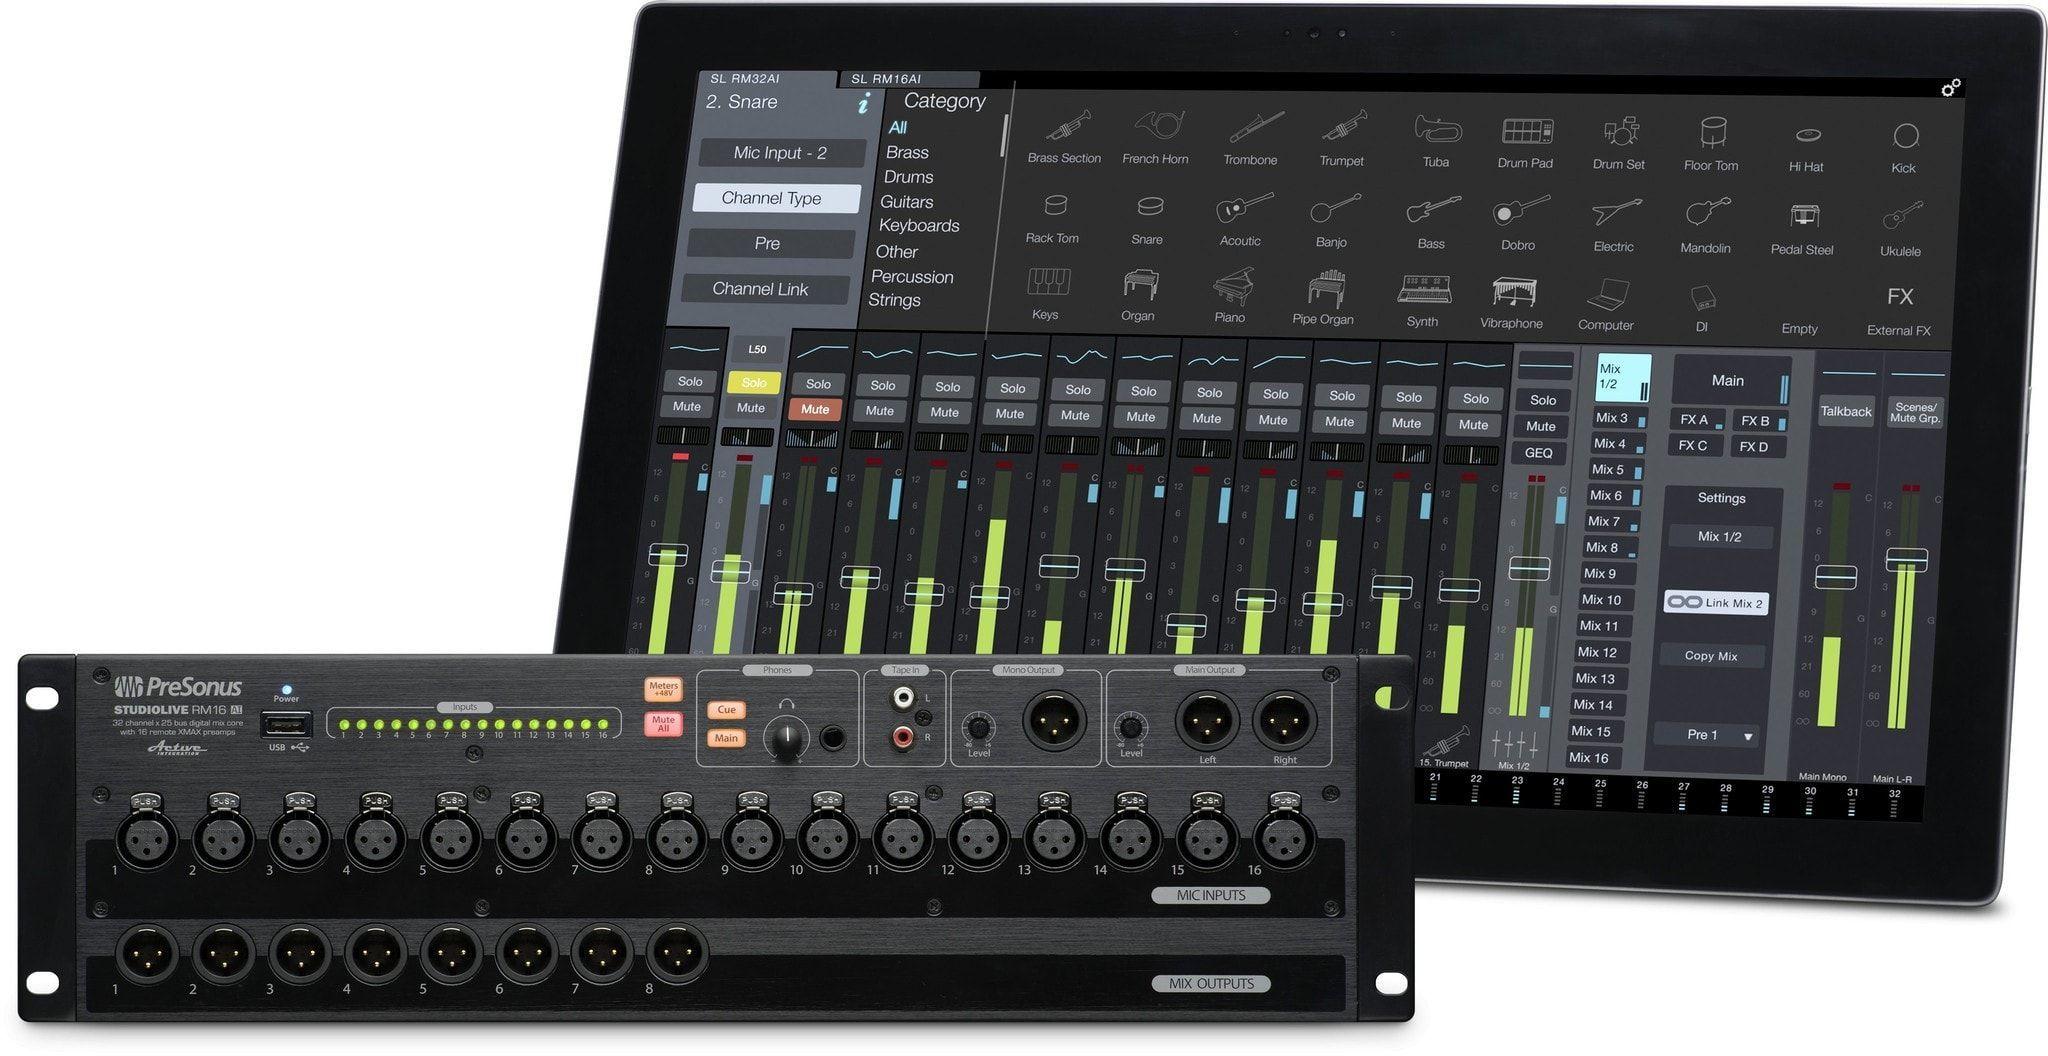 Presonus Studiolive Rm16ai 16 Channel Rack Mount Mixer Rack